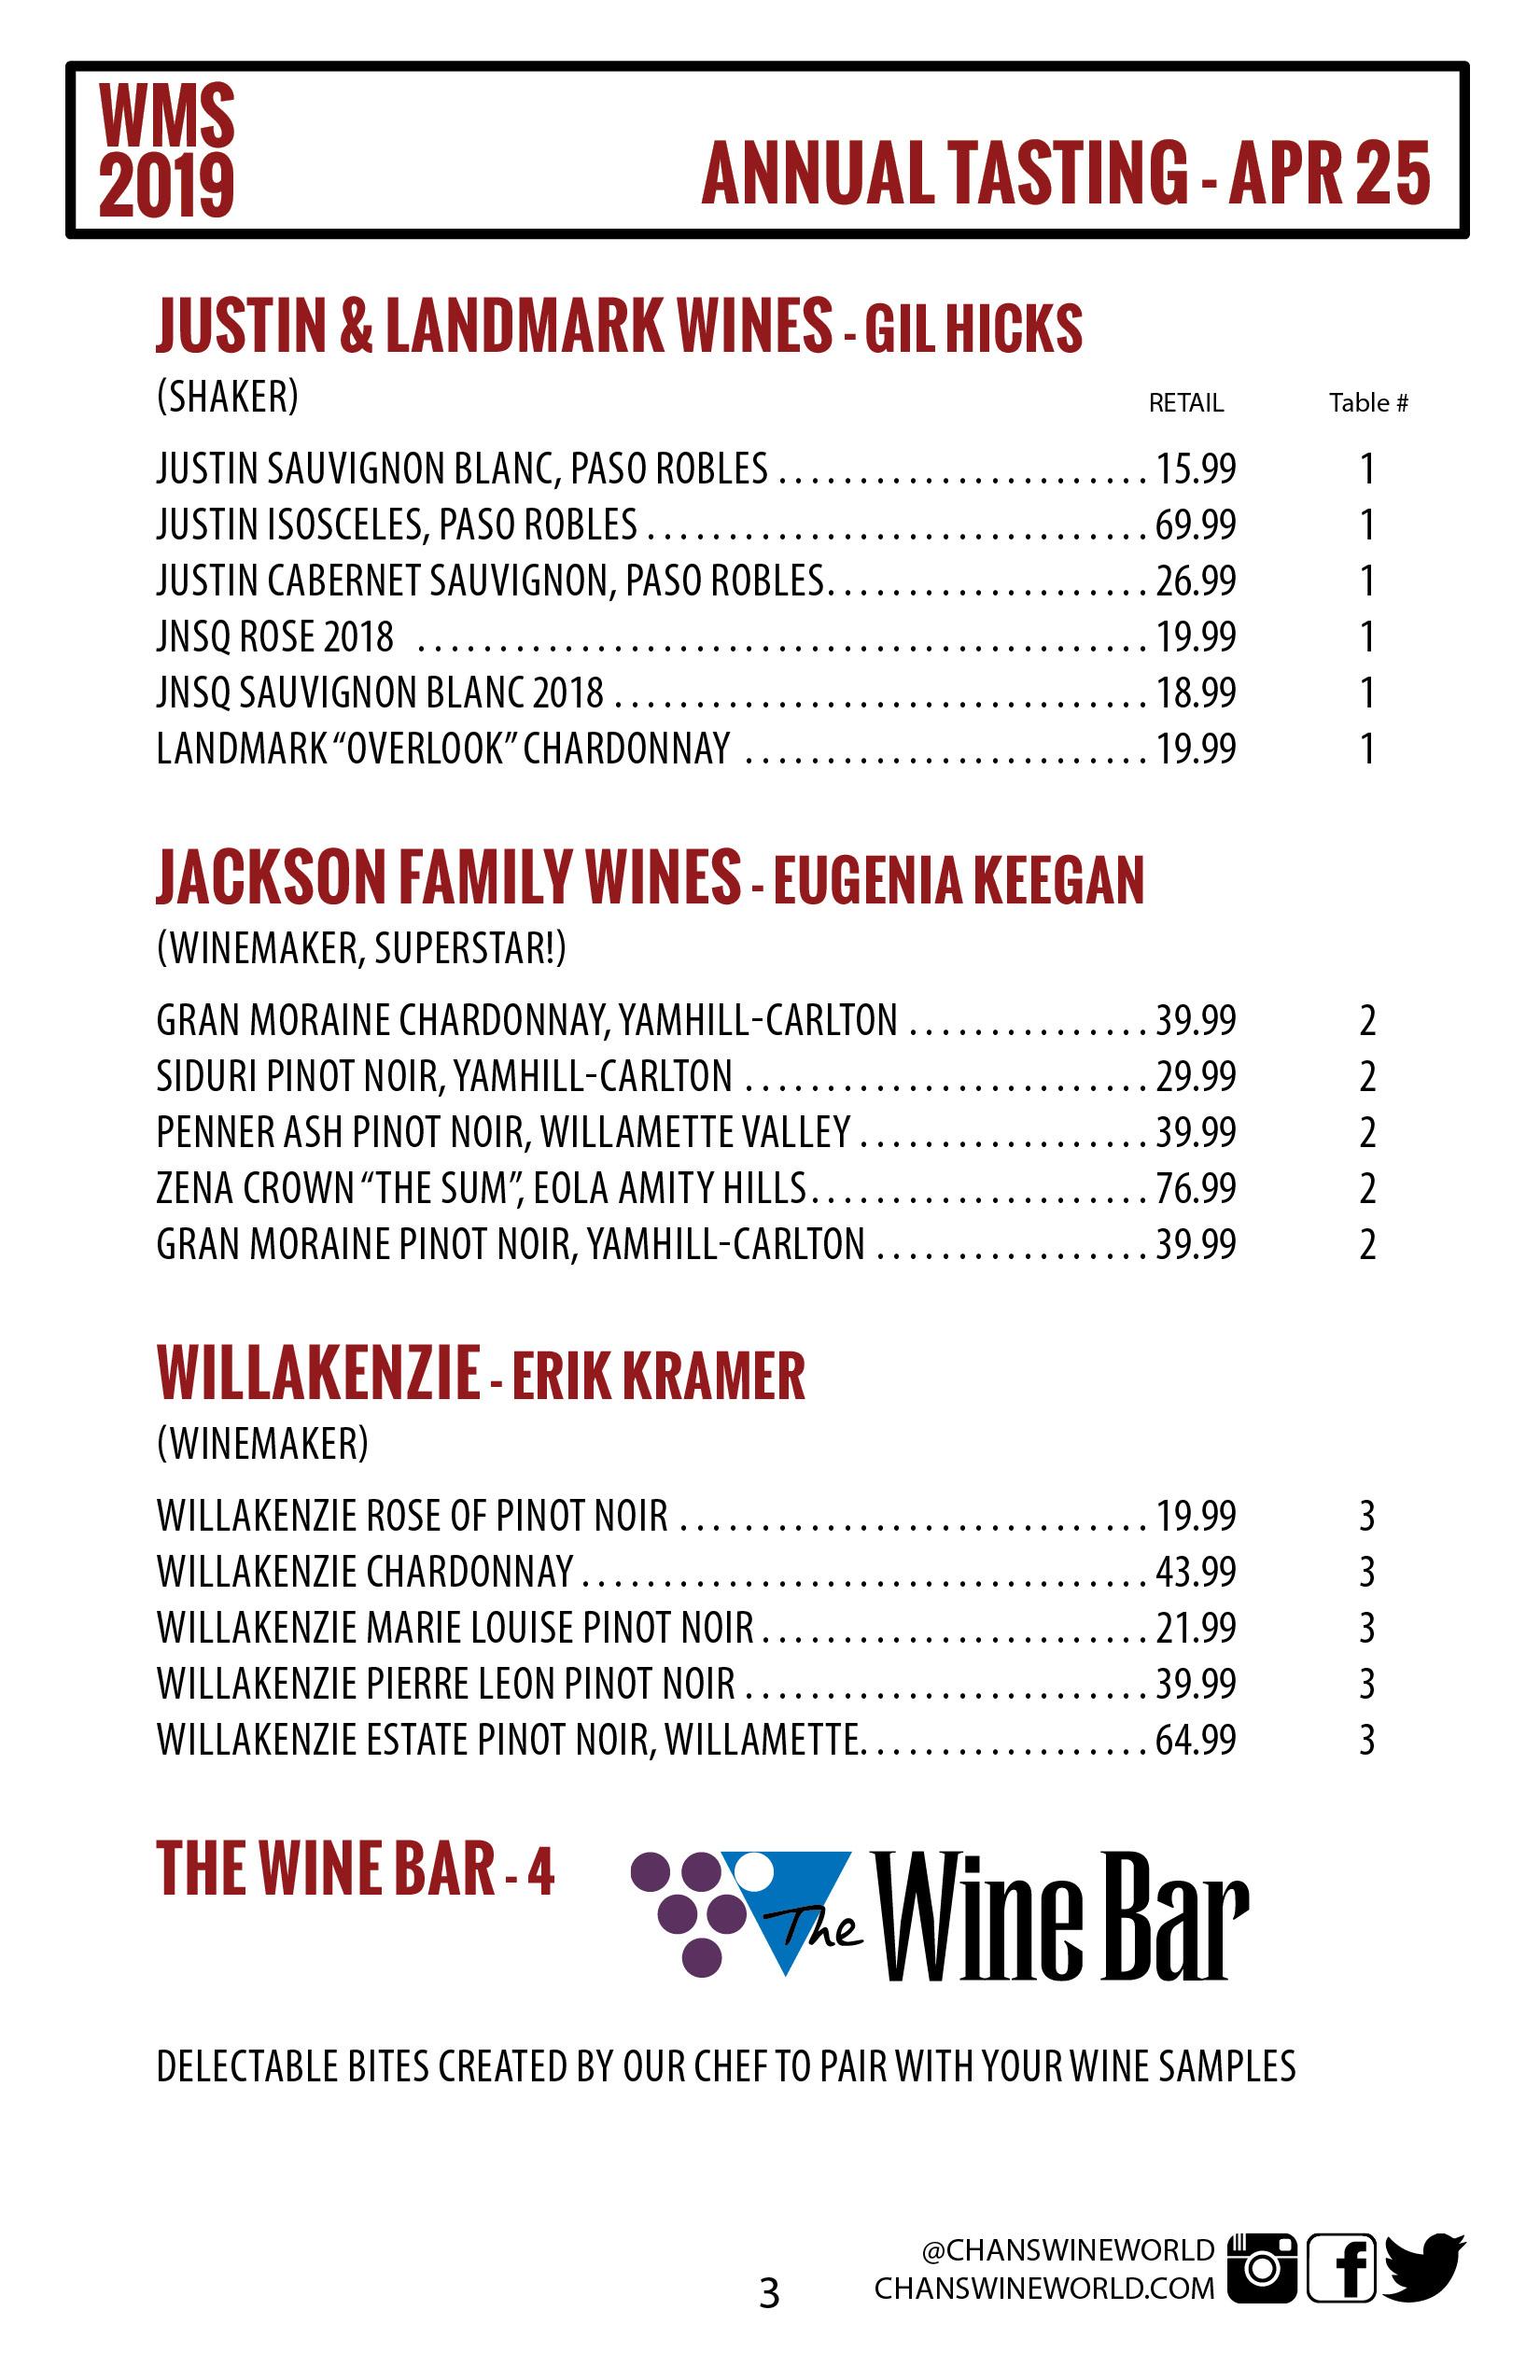 Winemakers and Shakers_Tasting Guide_20193.jpg